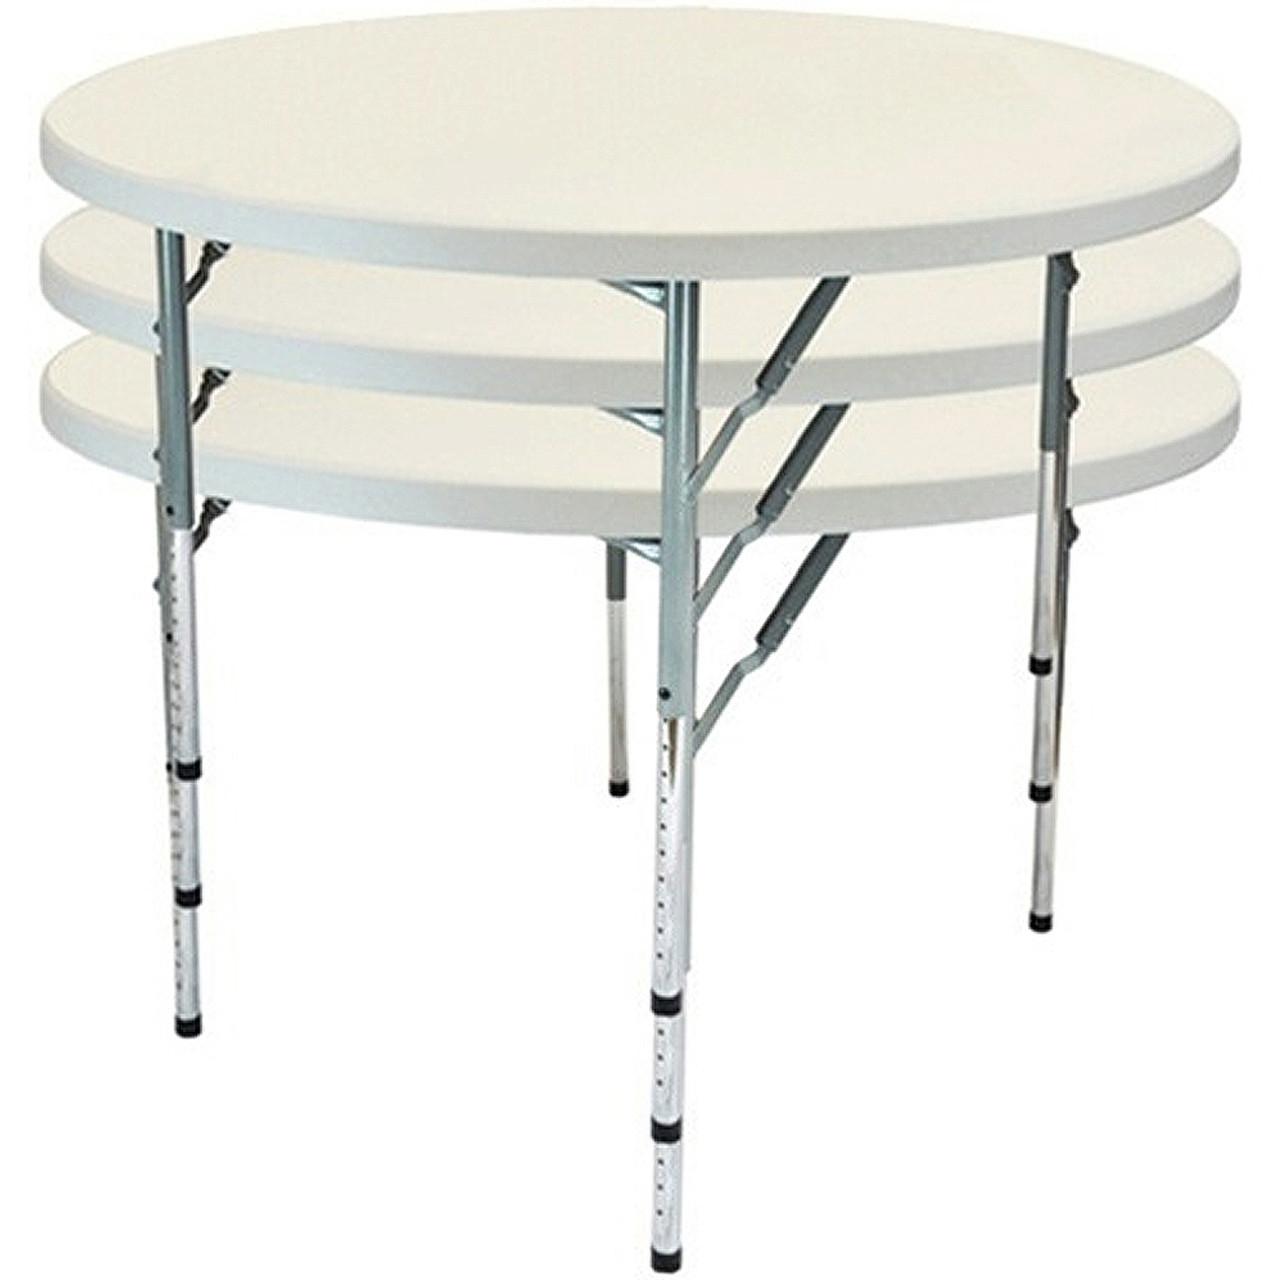 5 Pack Advantage 4 Round Adjustable Folding Tables Ftd48r Adj 05 Adjustable Folding Tables